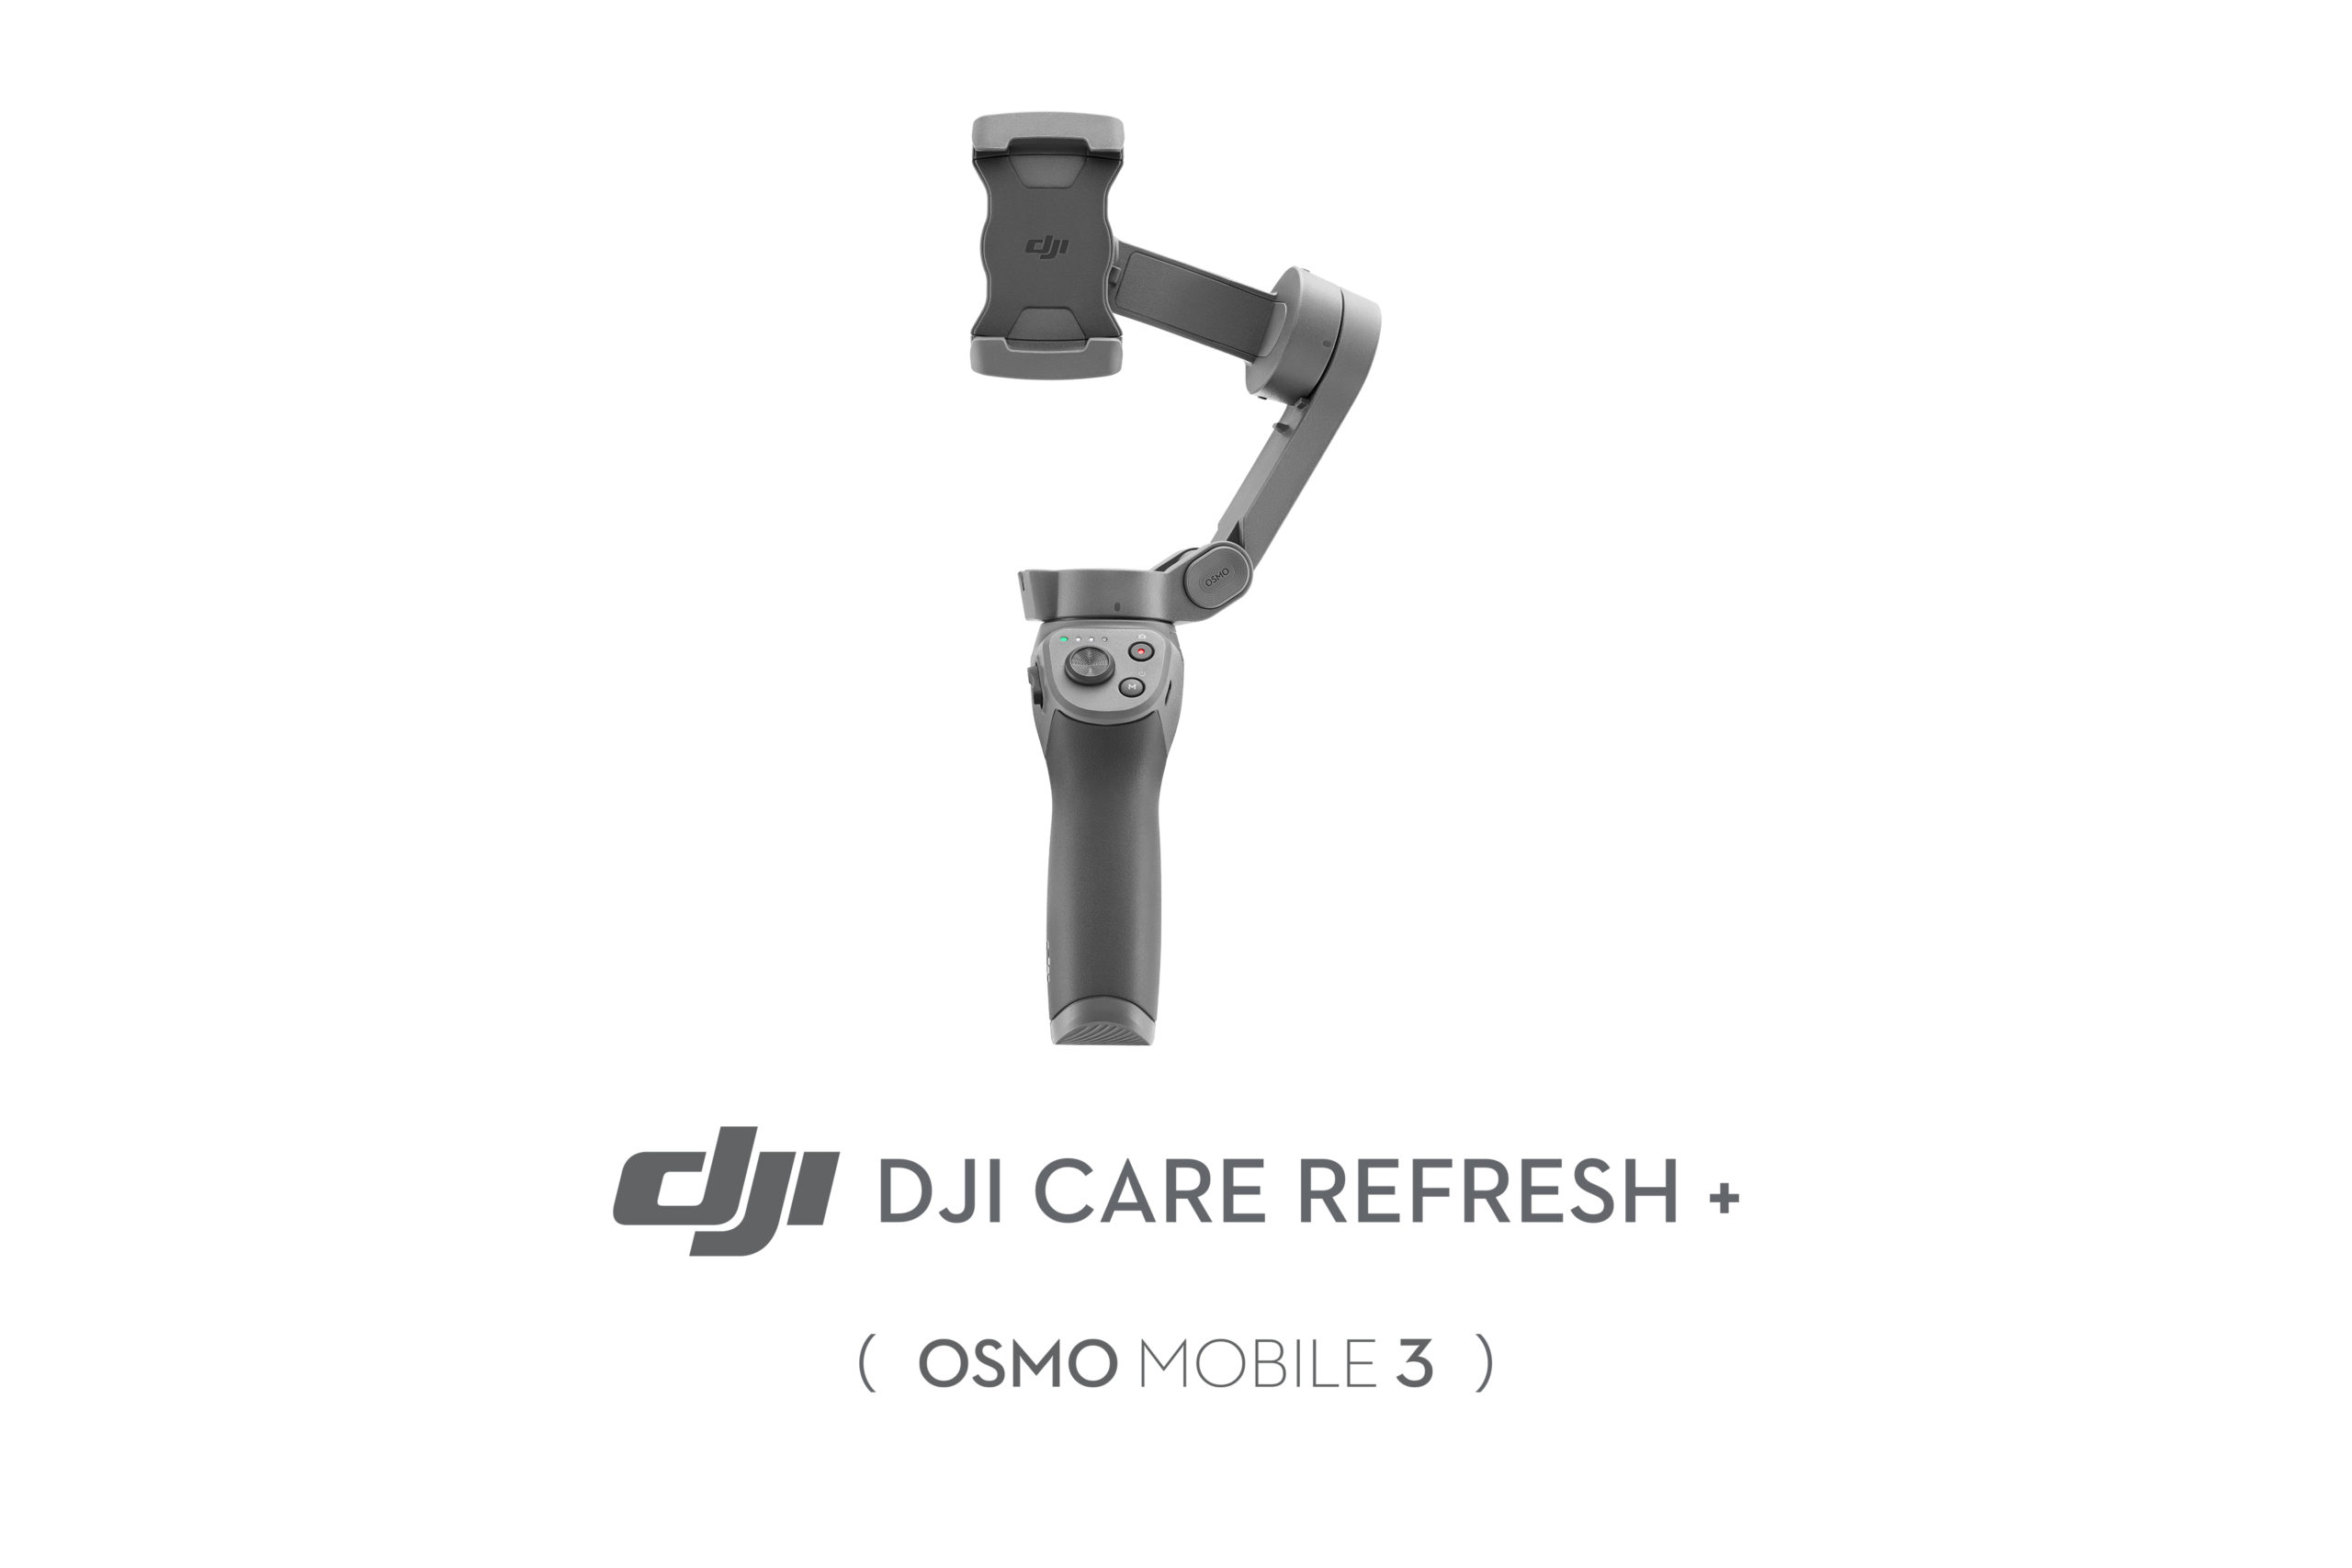 DJI Care Refresh Plus Osmo Mobile 3